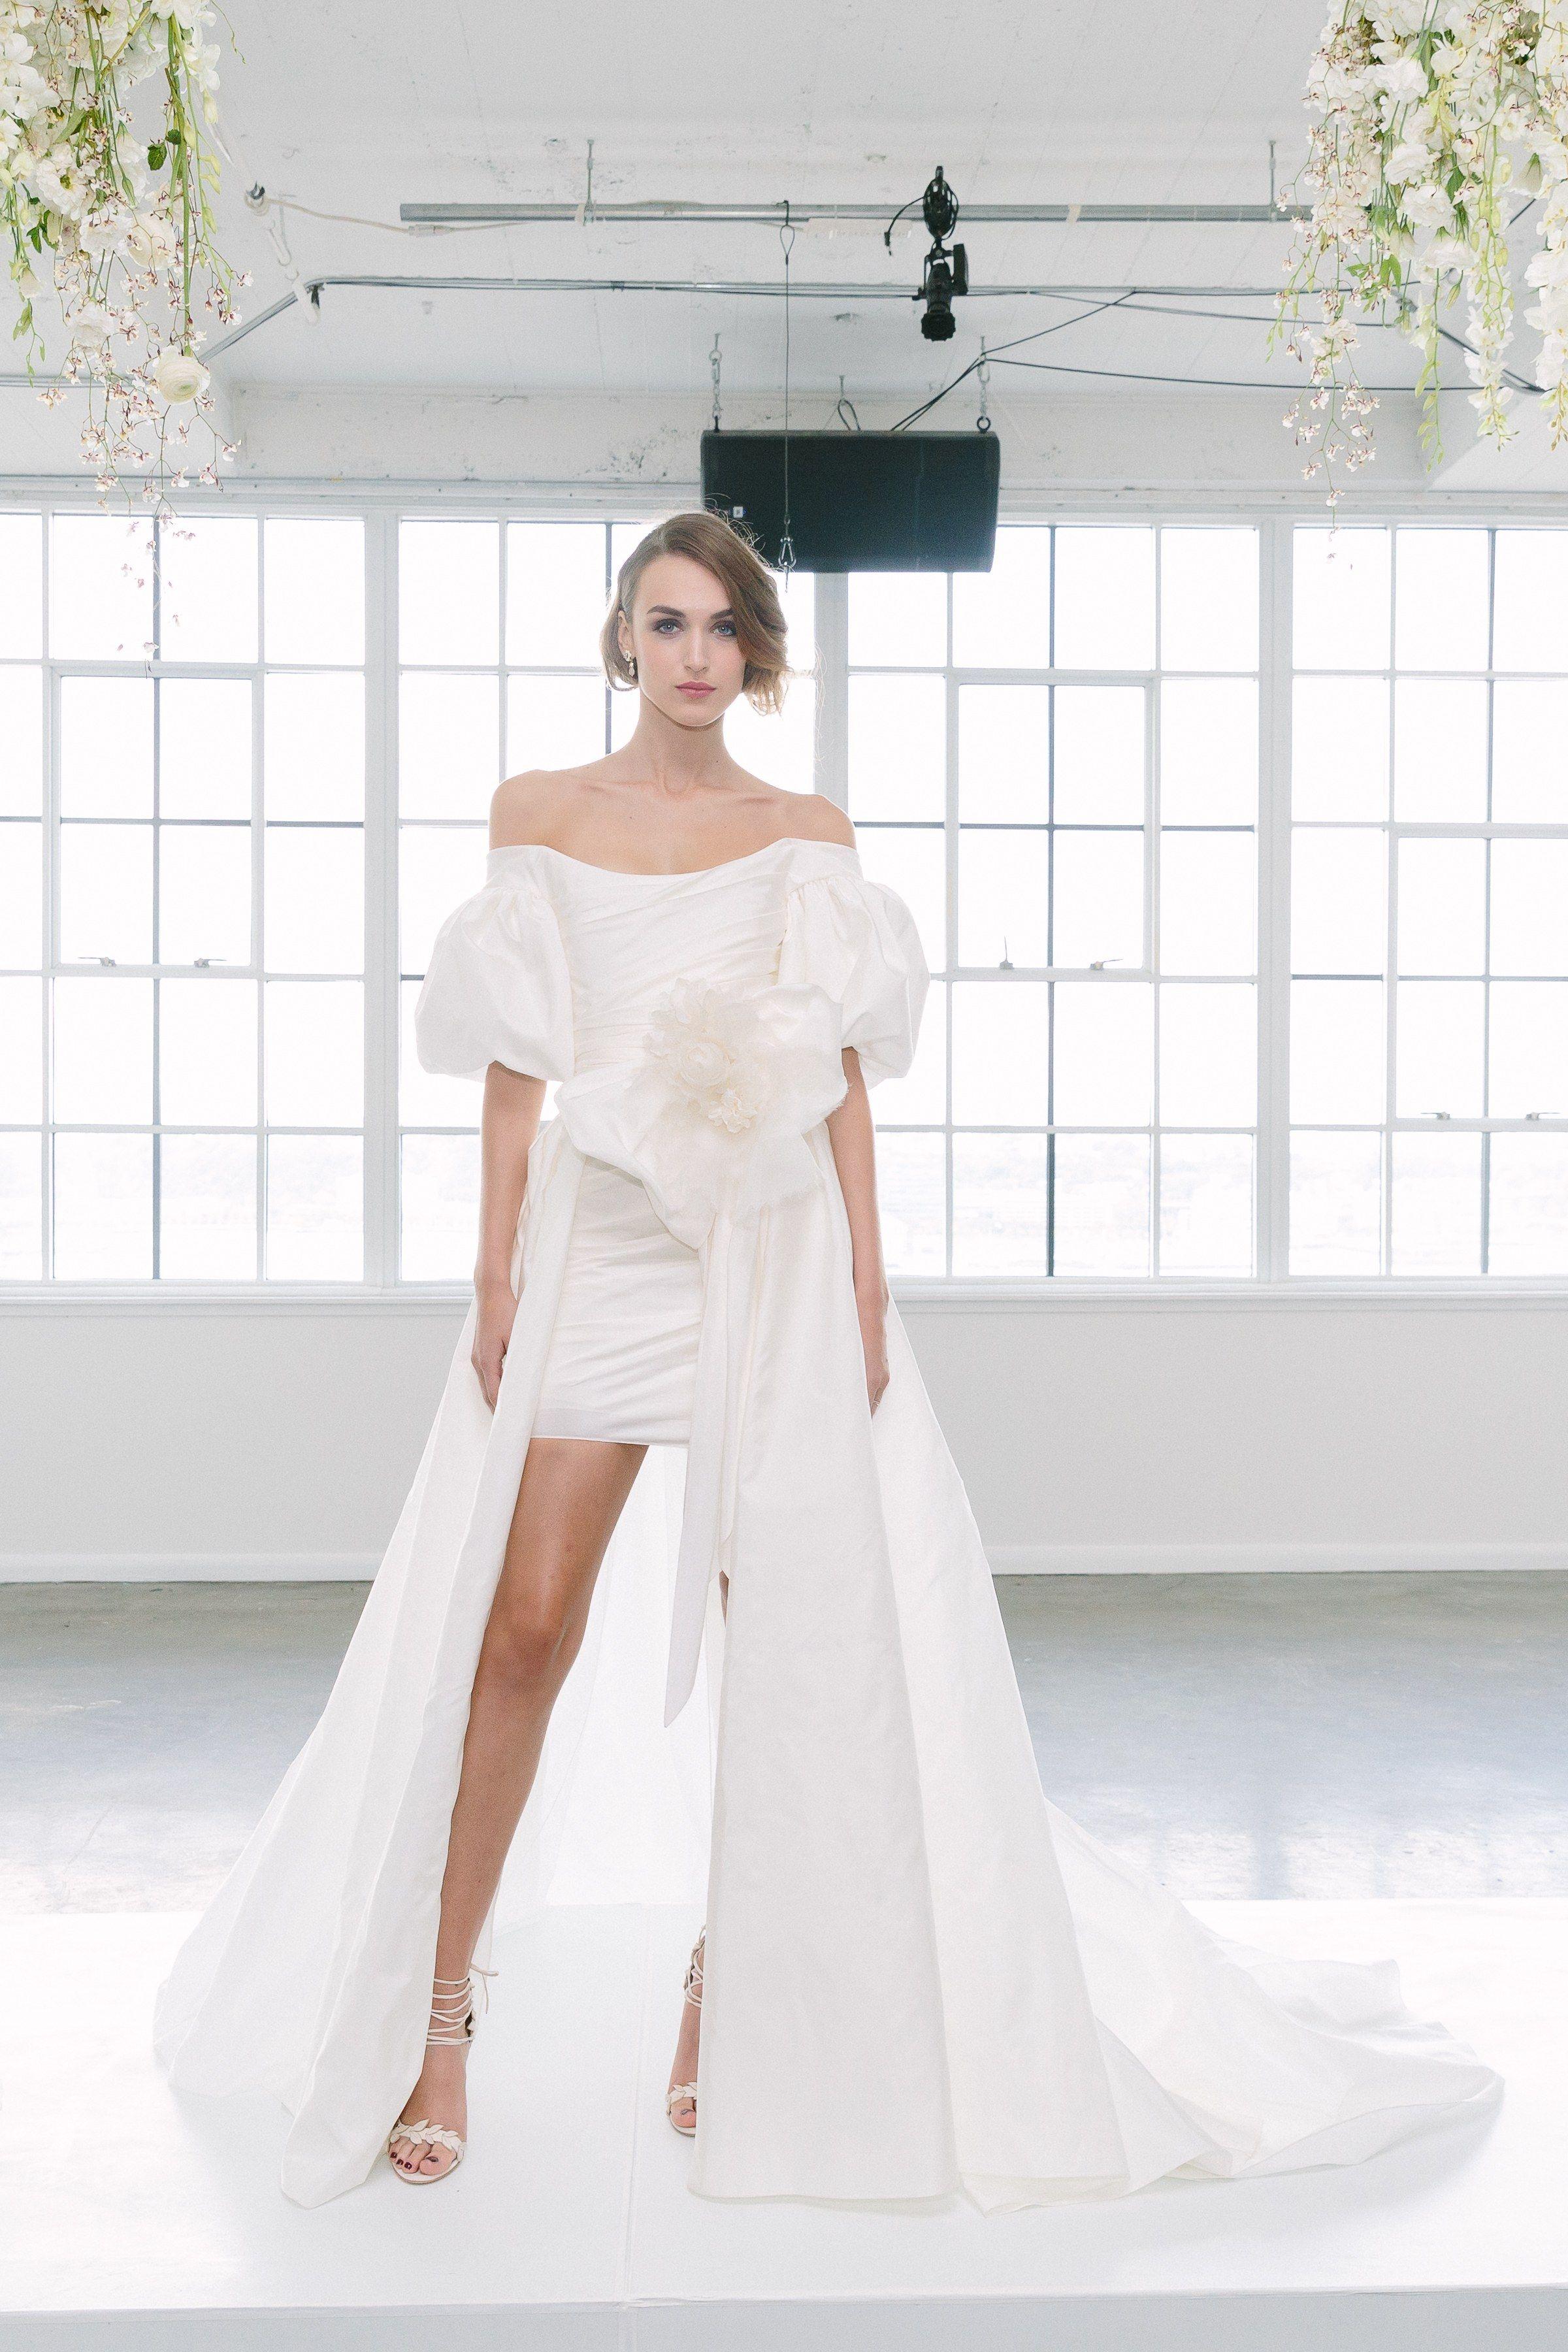 Bridal wedding dresses  Marchesa Bridal  Market picks  Pinterest  Wedding dress trends